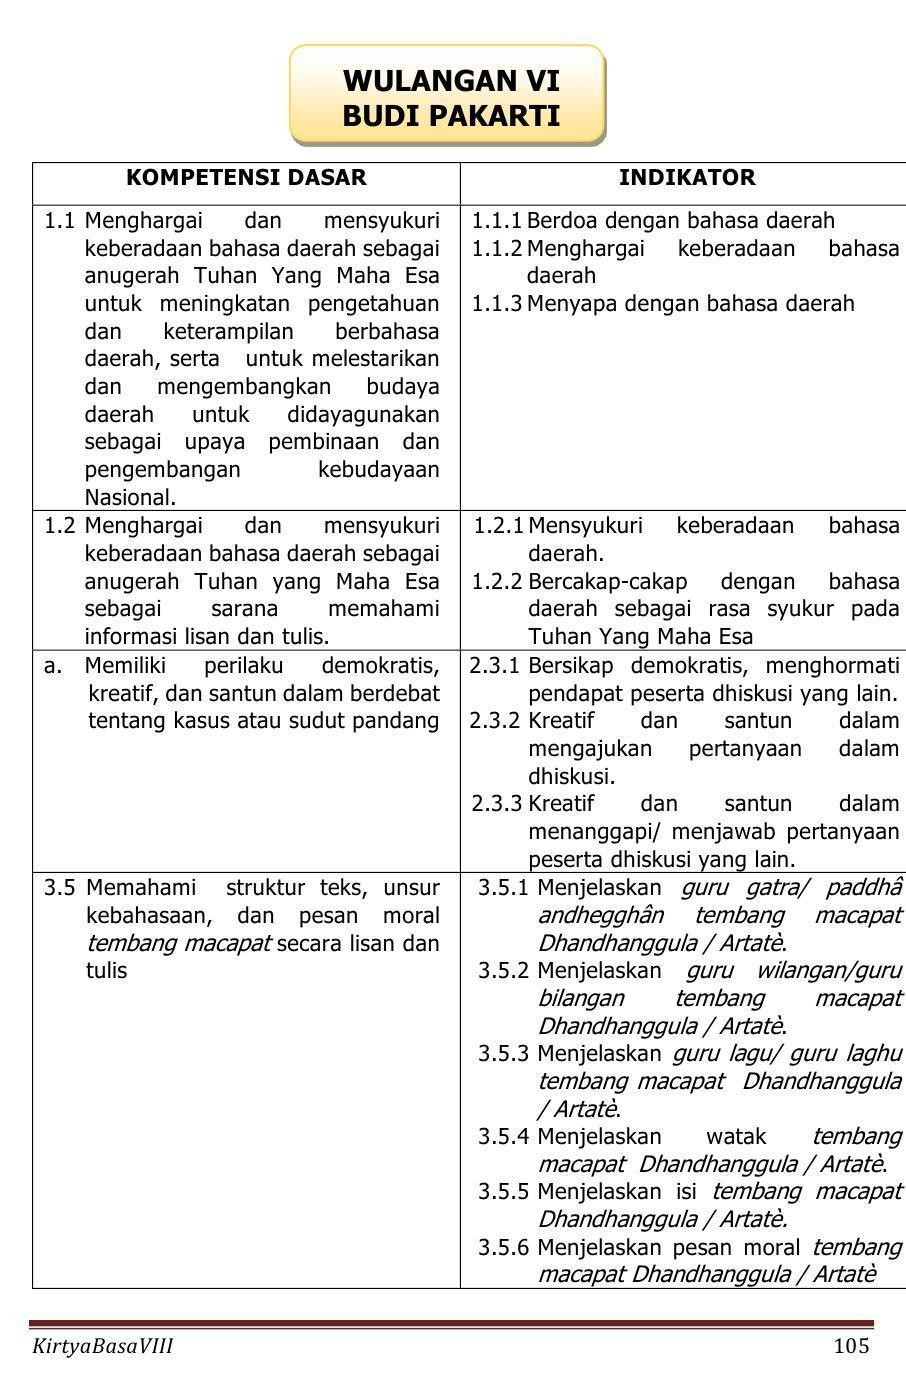 Buku Siswa Kelas 8 Bahasa Jawa Kirtya Basa 2015 For Android Apk Download